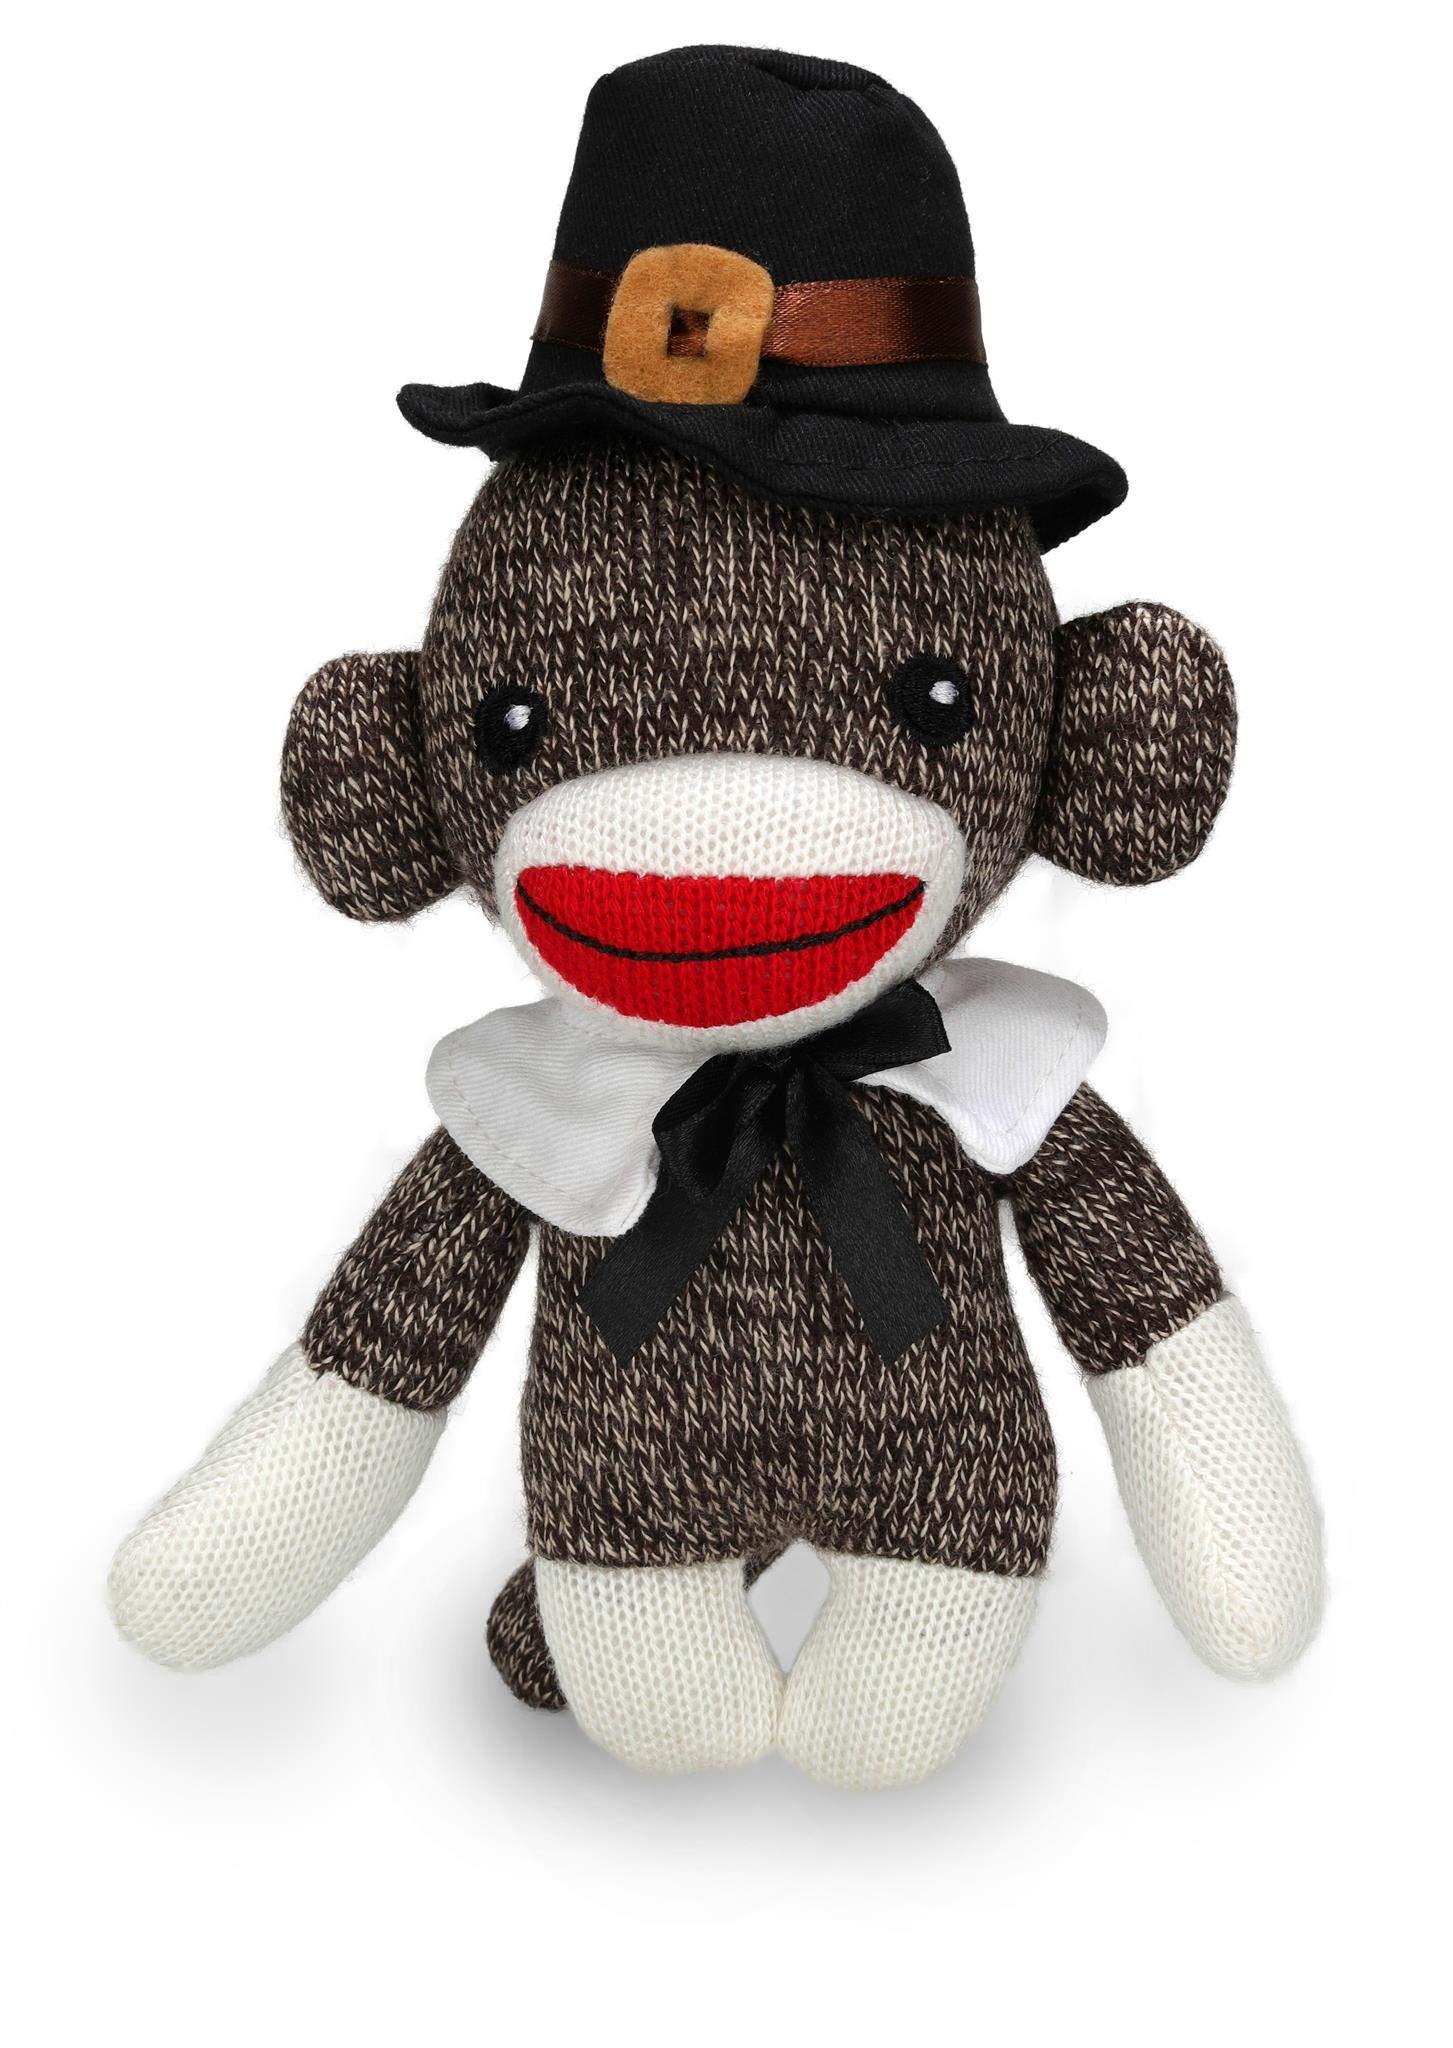 76c50dc04 Plushland Stuffed Pilgrim Sock Monkey - with Cute Hat and Collar - Plush  Stuffed Toy for Kids on Tha